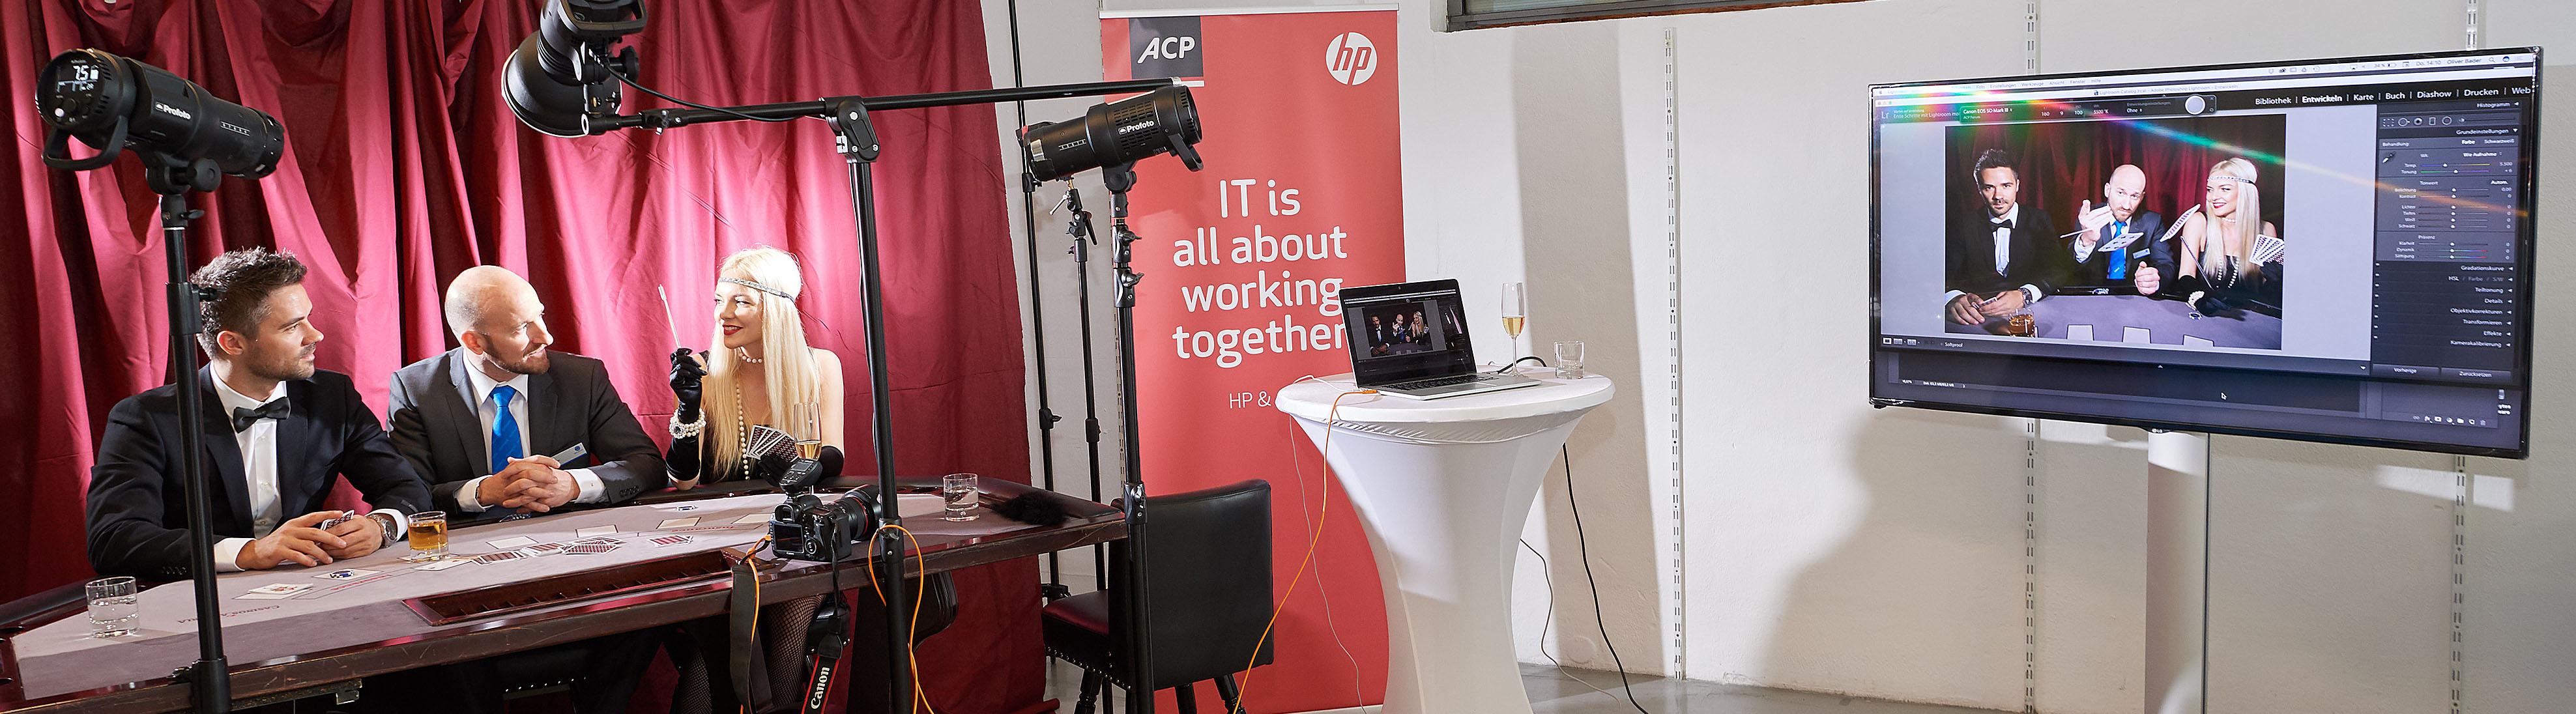 ACP-Forum-SBG-titelbild-1